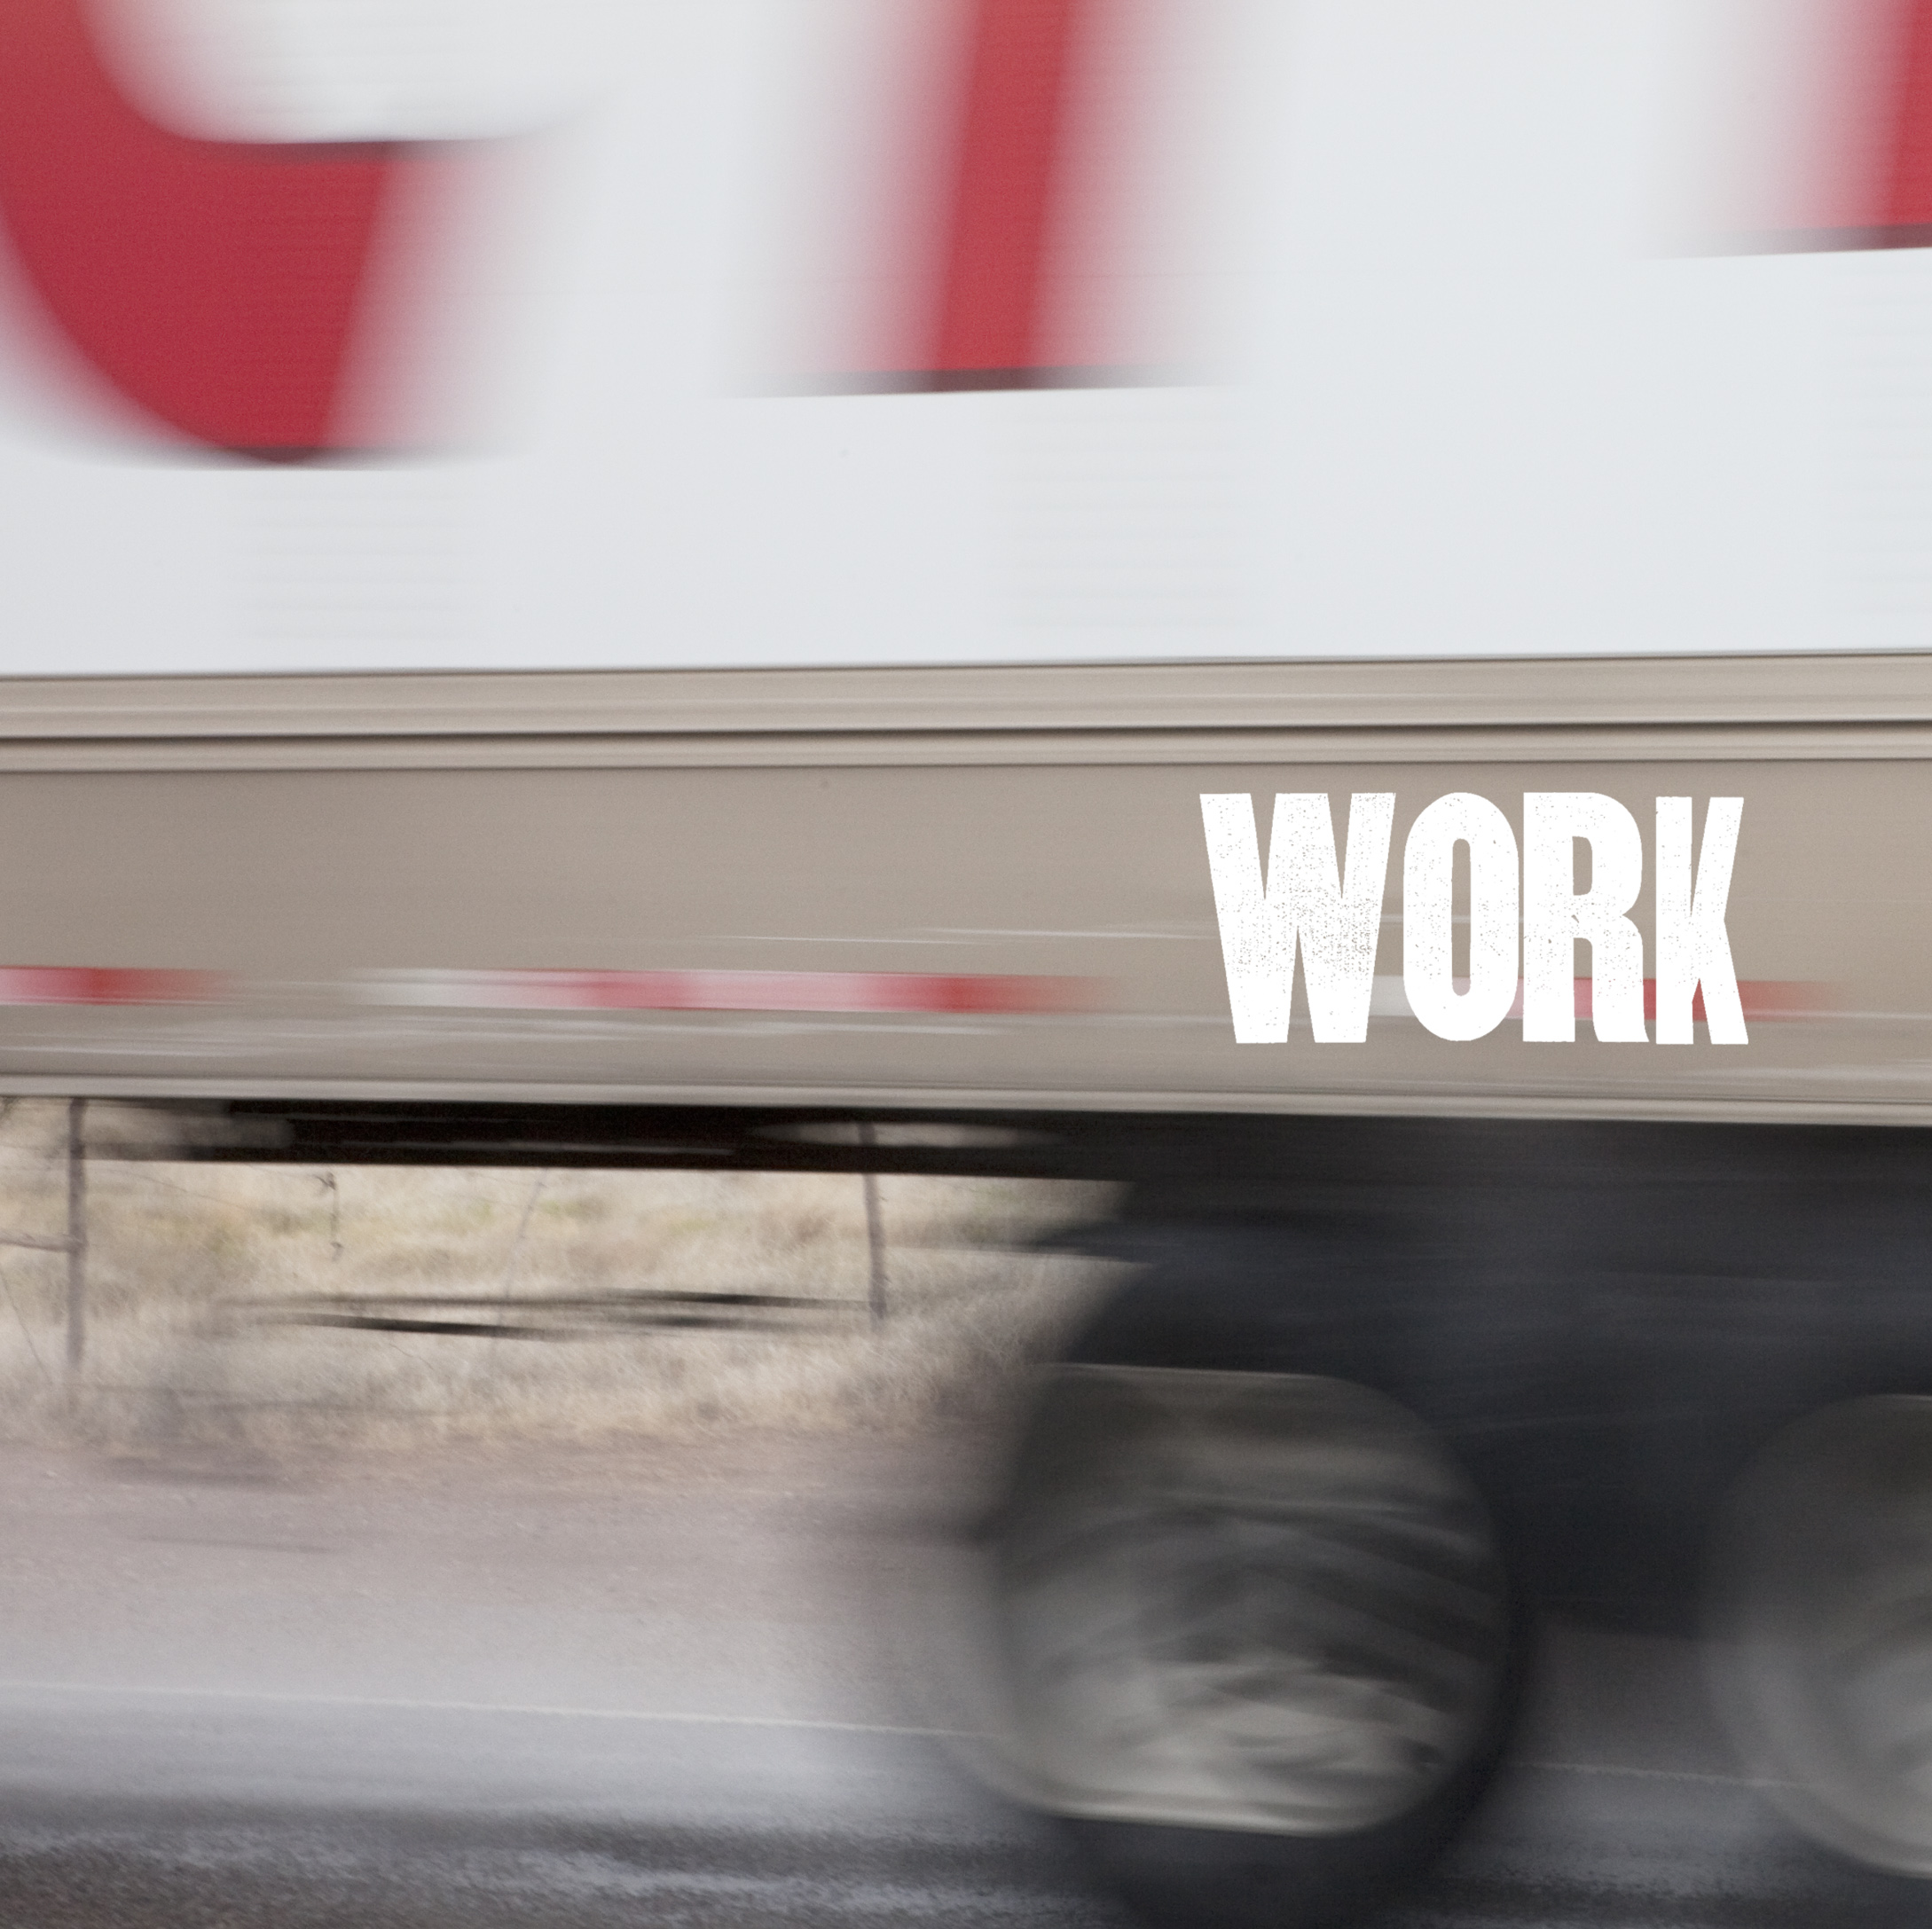 R-WORK truck.jpg